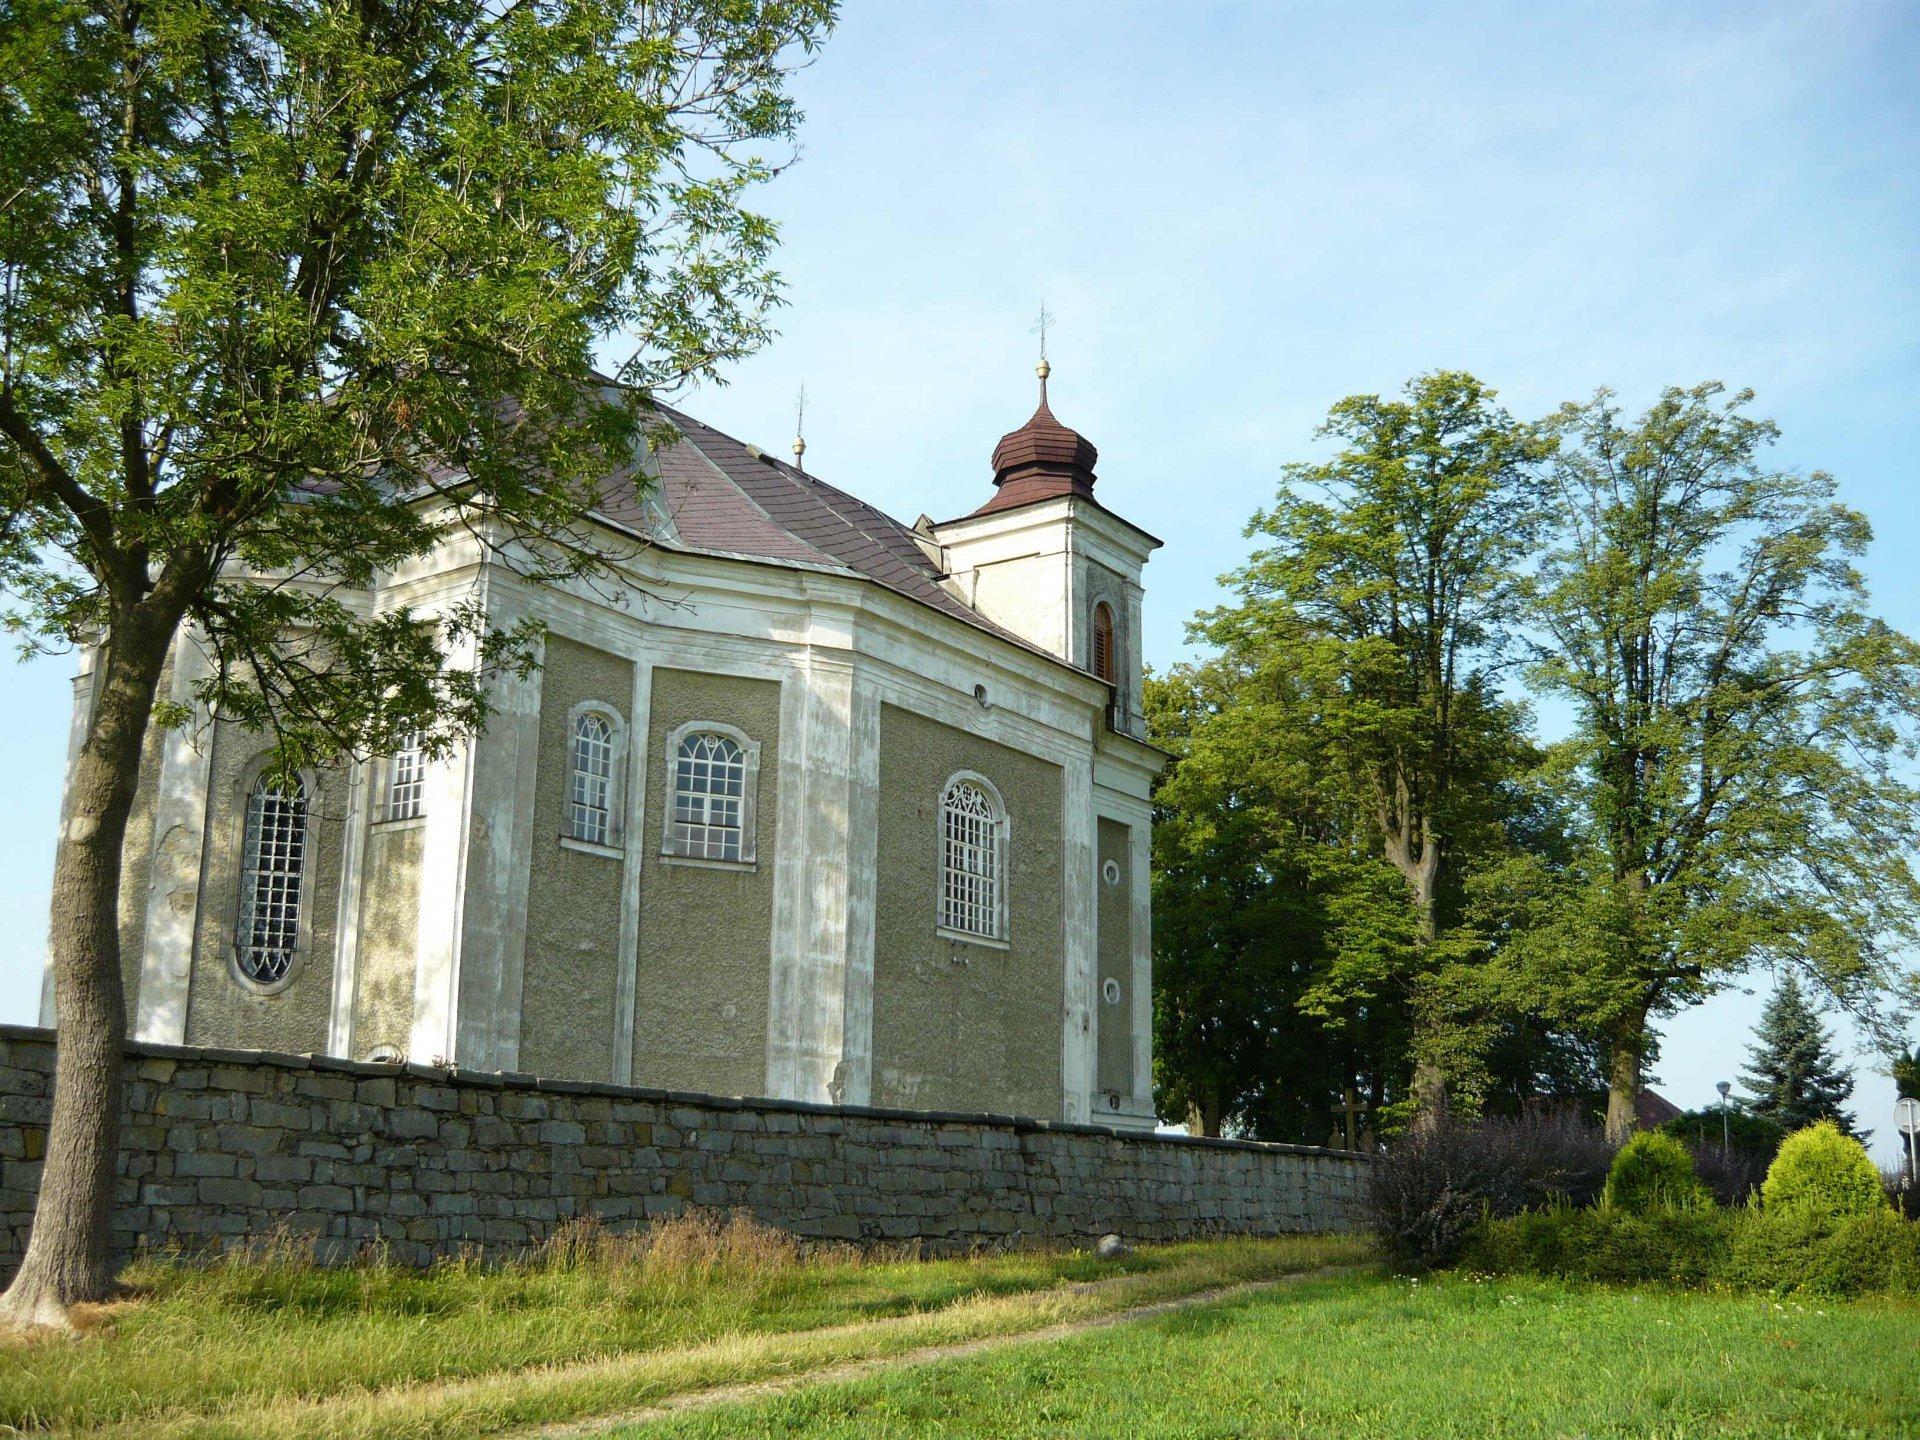 Bösig an der Mettau (Bezděkov nad Metují), Pfarrkirche St. Prokop